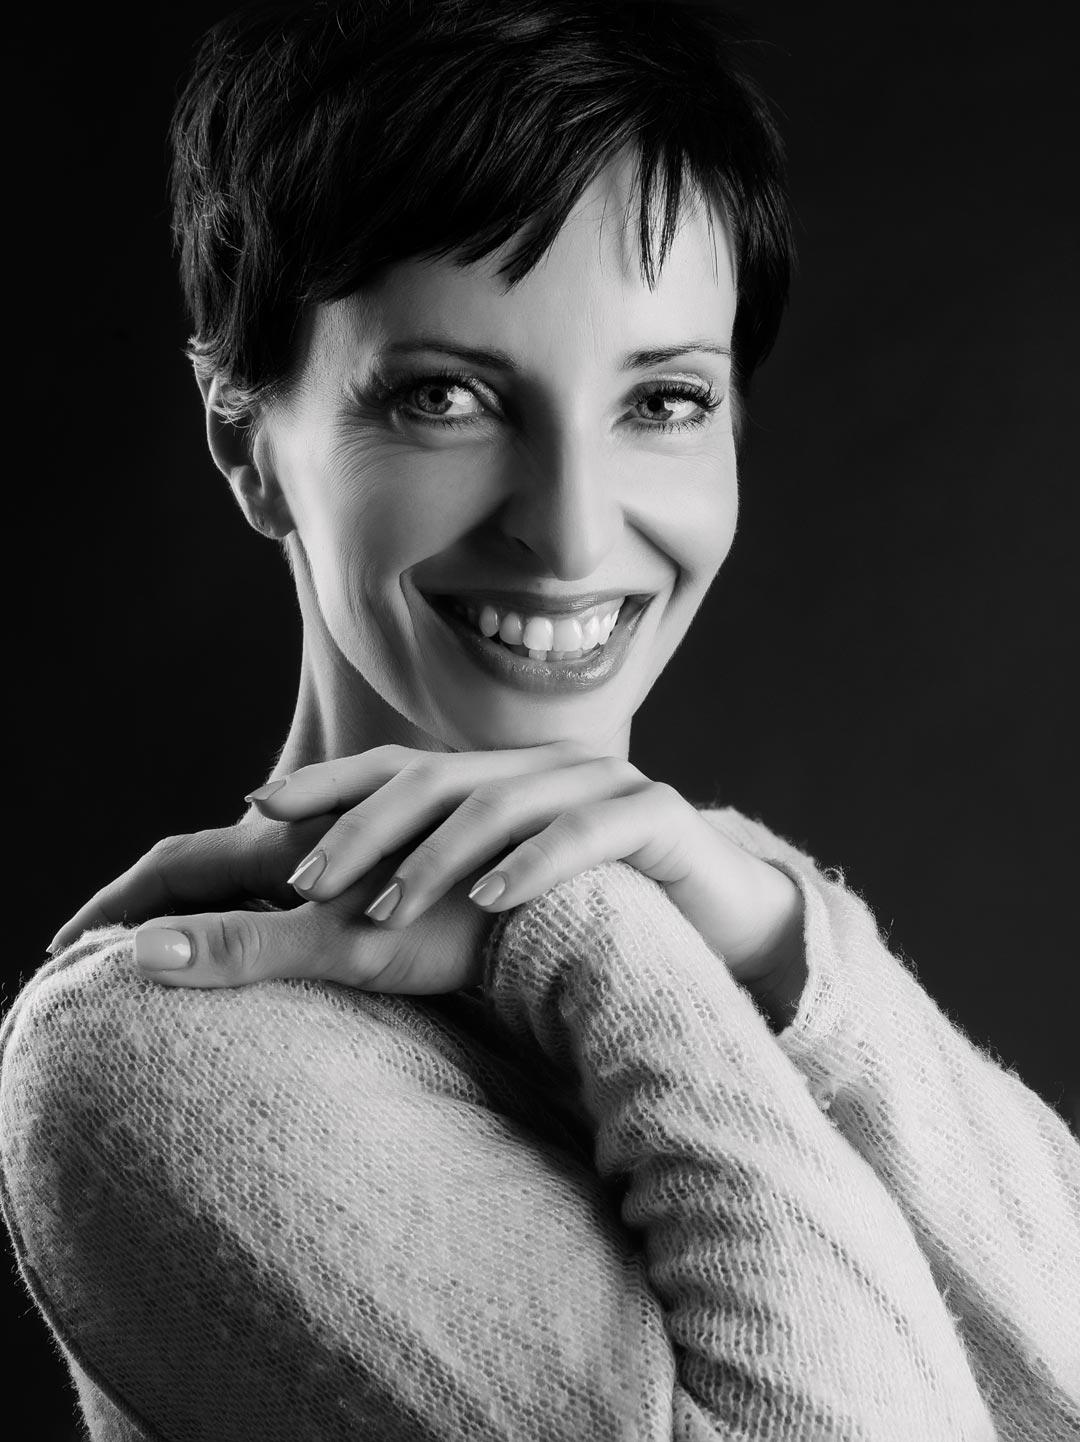 Fotografie Herzberg – Portrait